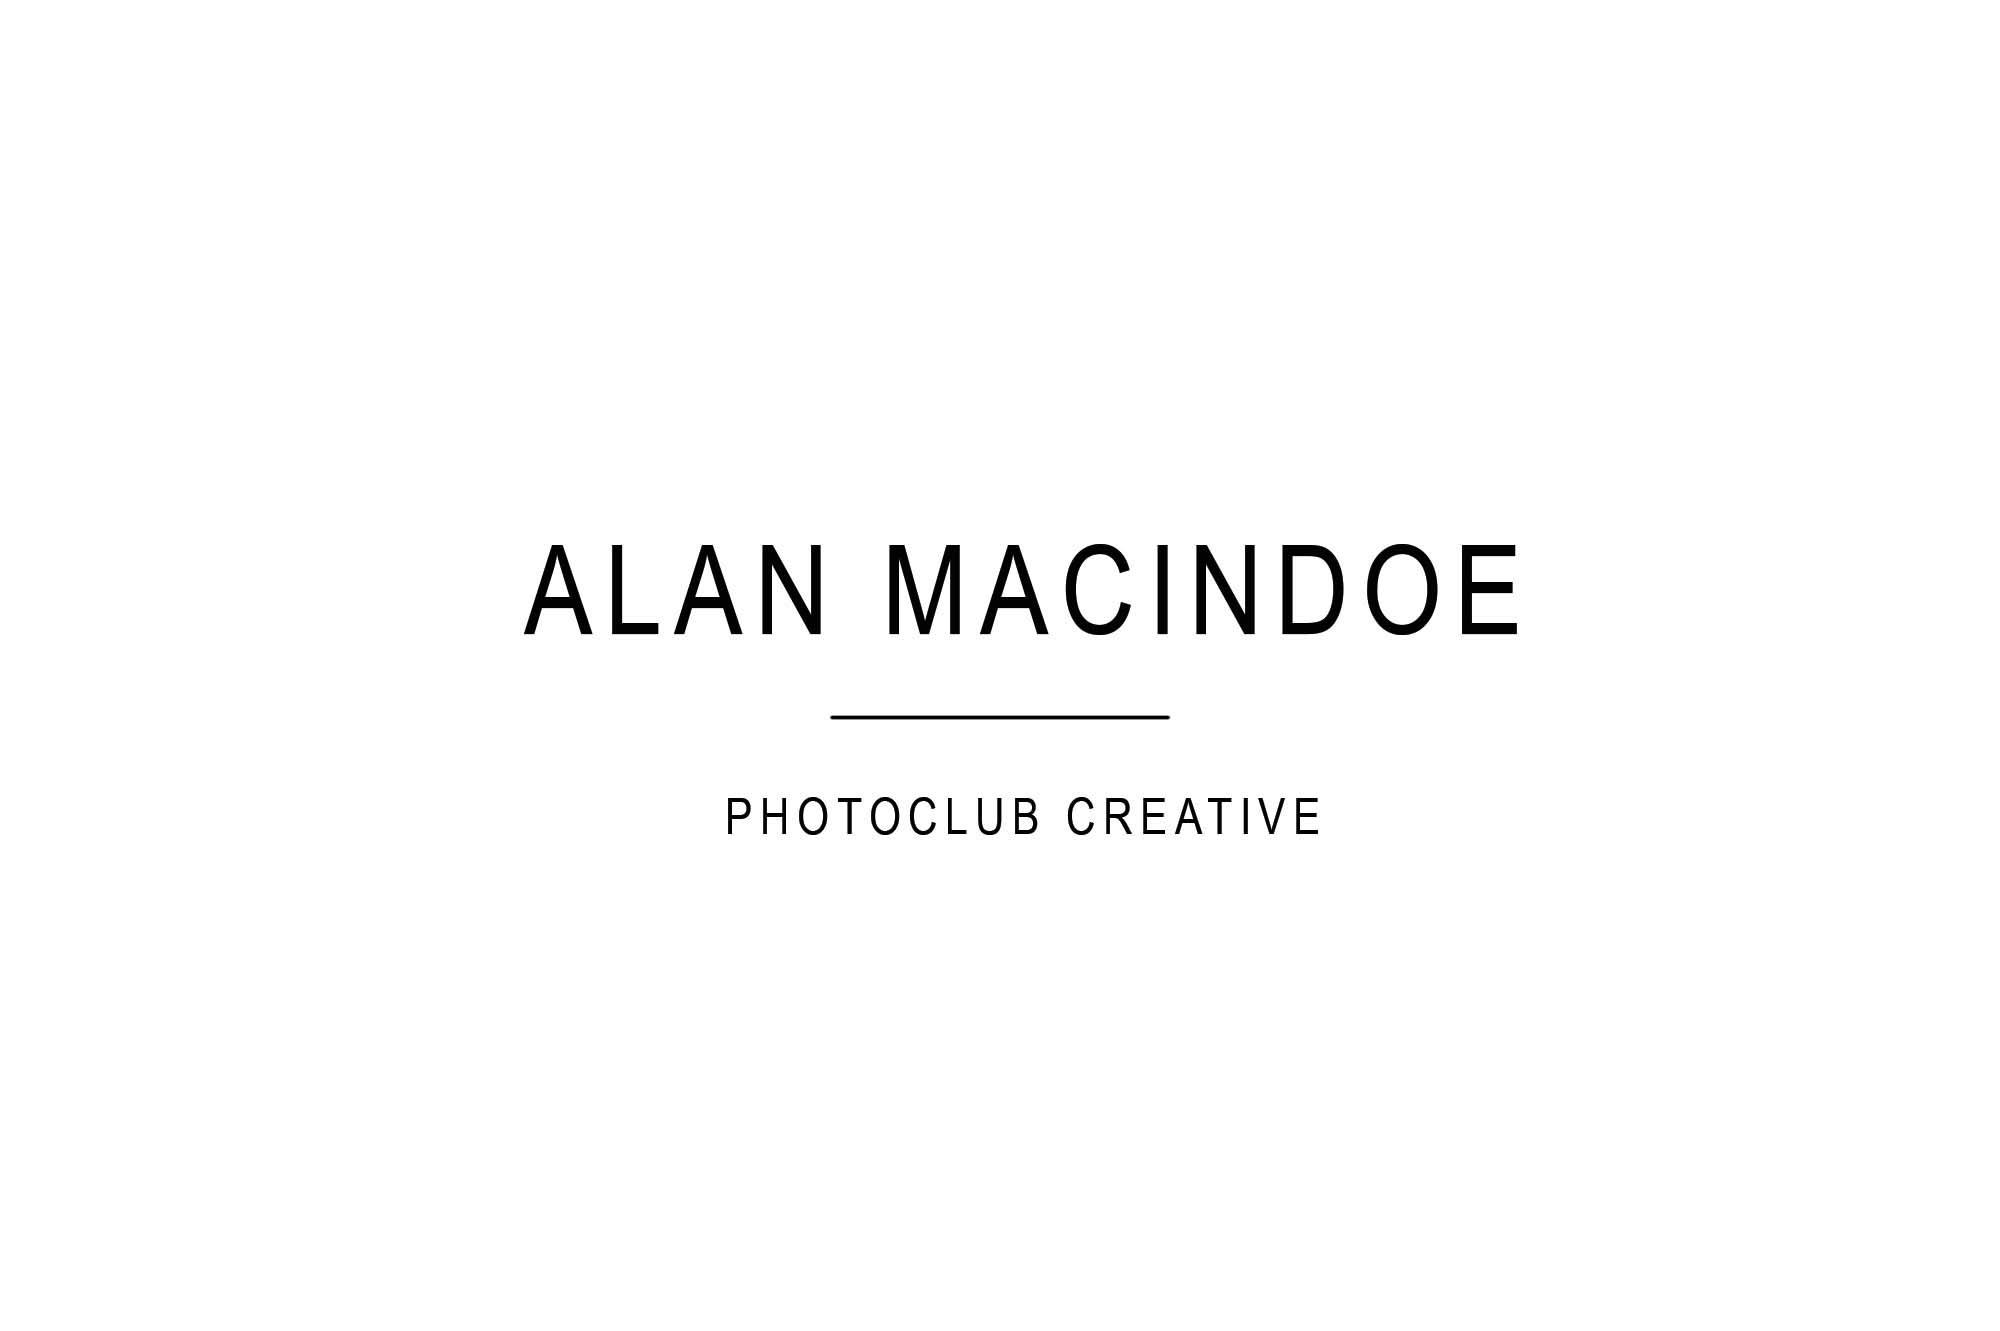 AlanMacindoe_00_Title_WhtBg.jpg